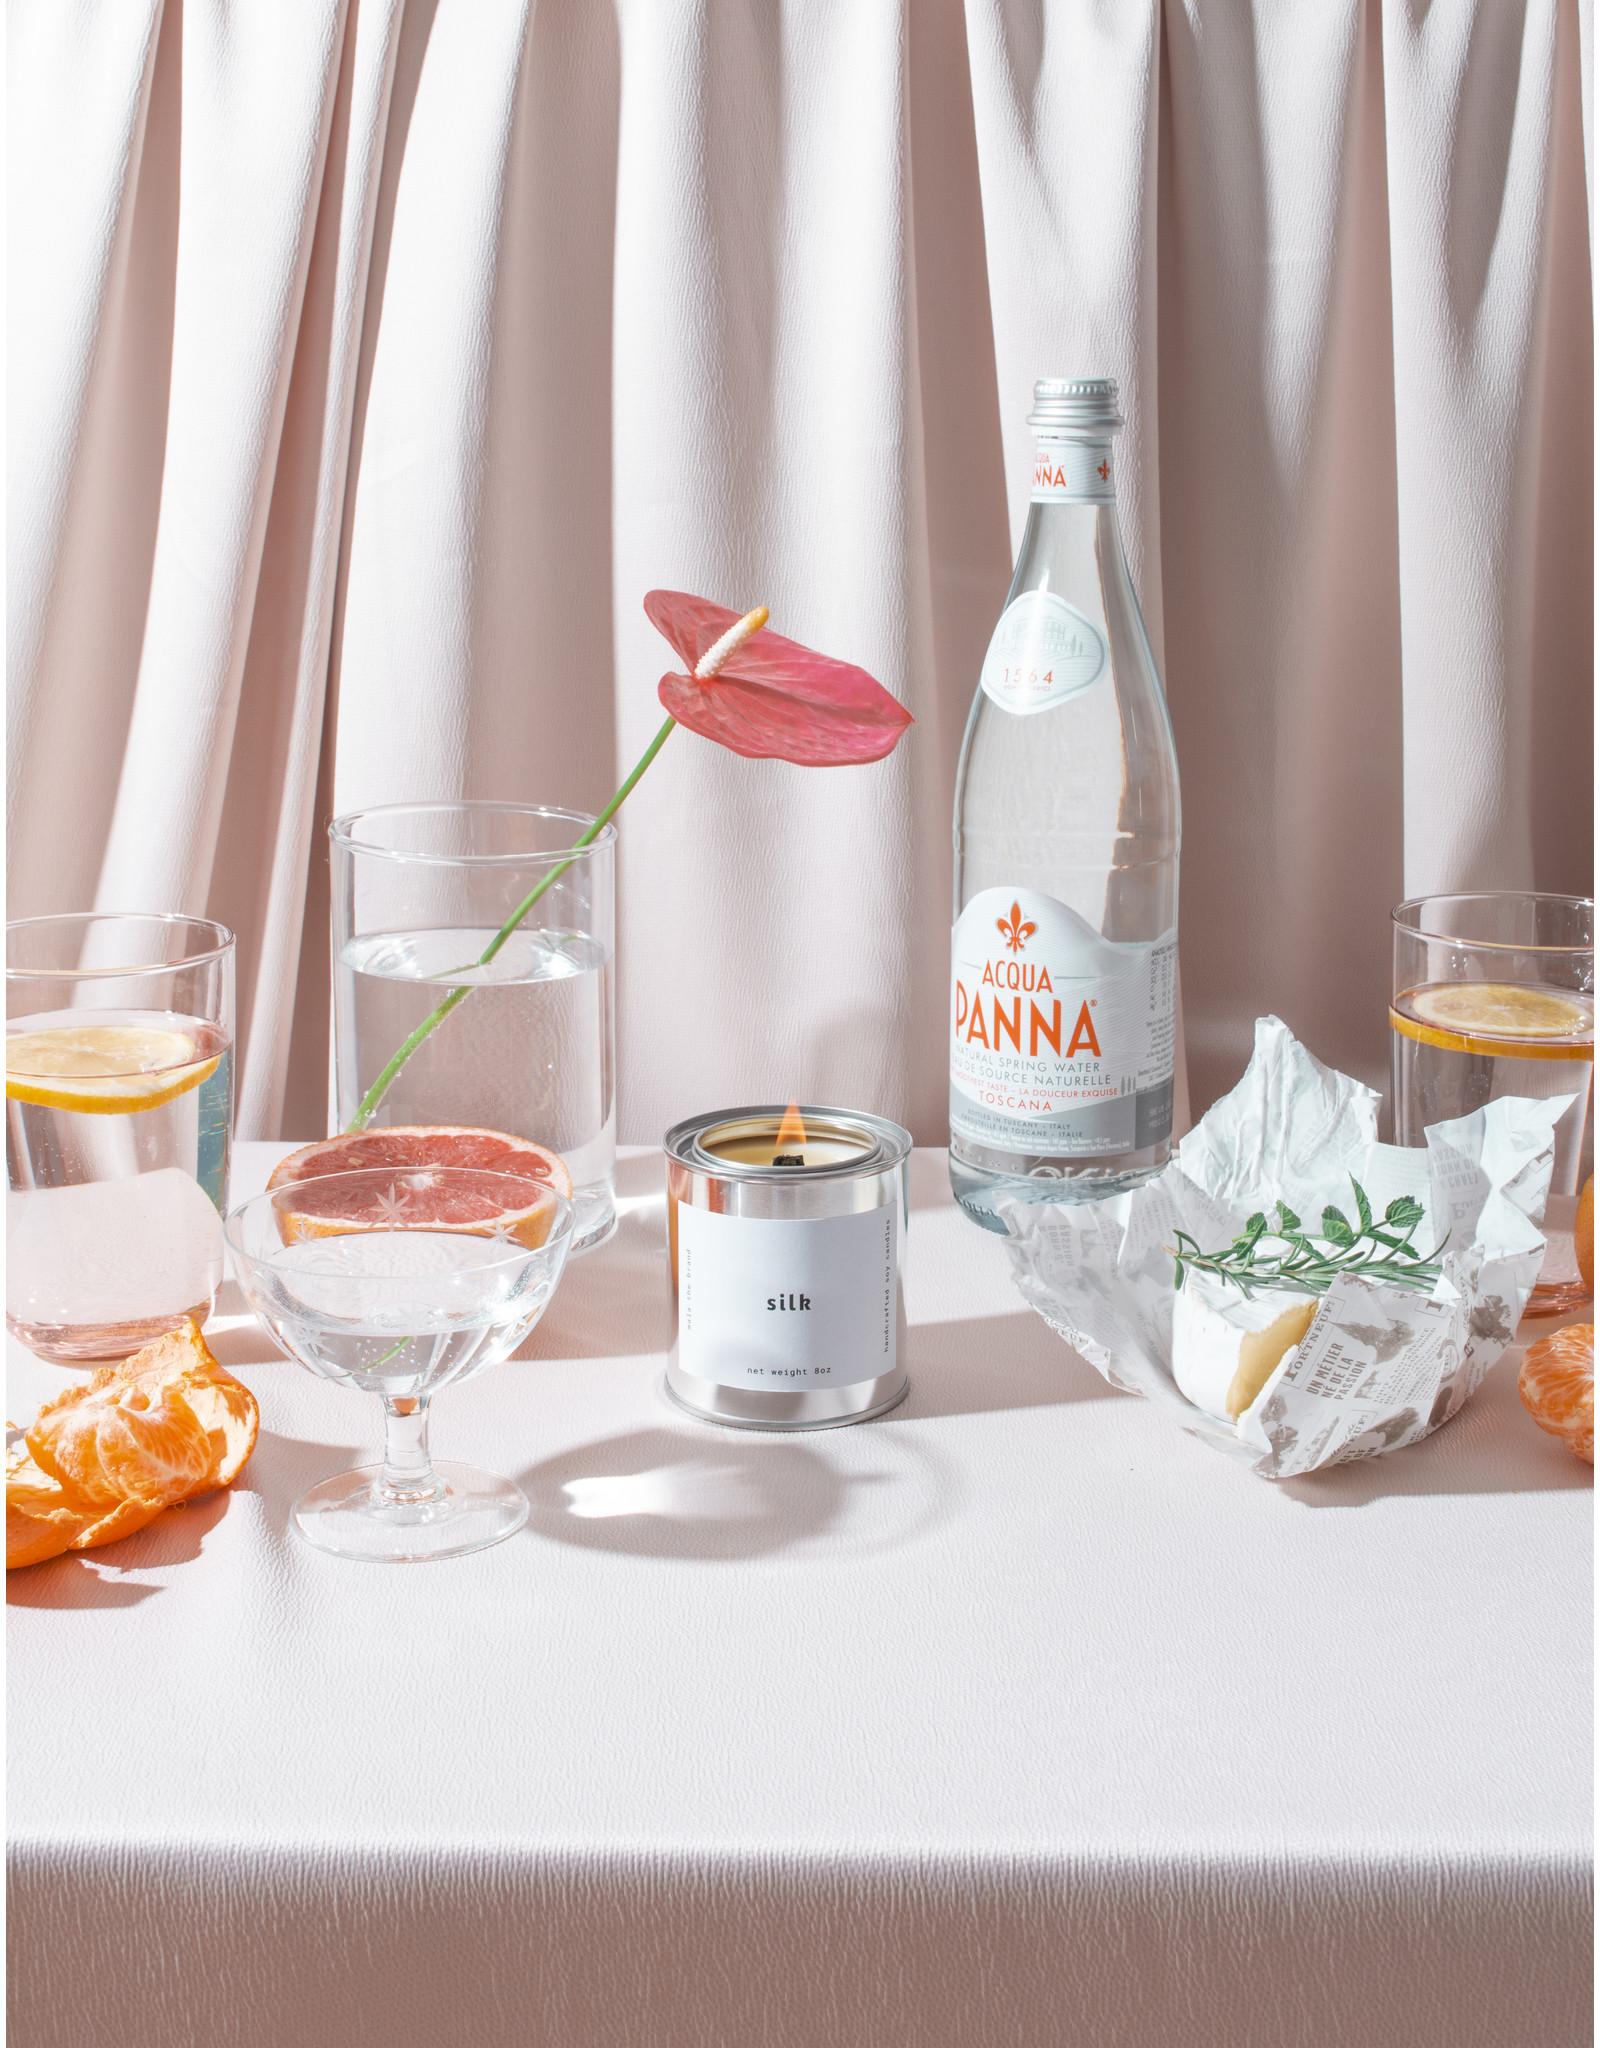 Mala The Brand Silk Candle / Jasmine + Coconut + Tonka Bean